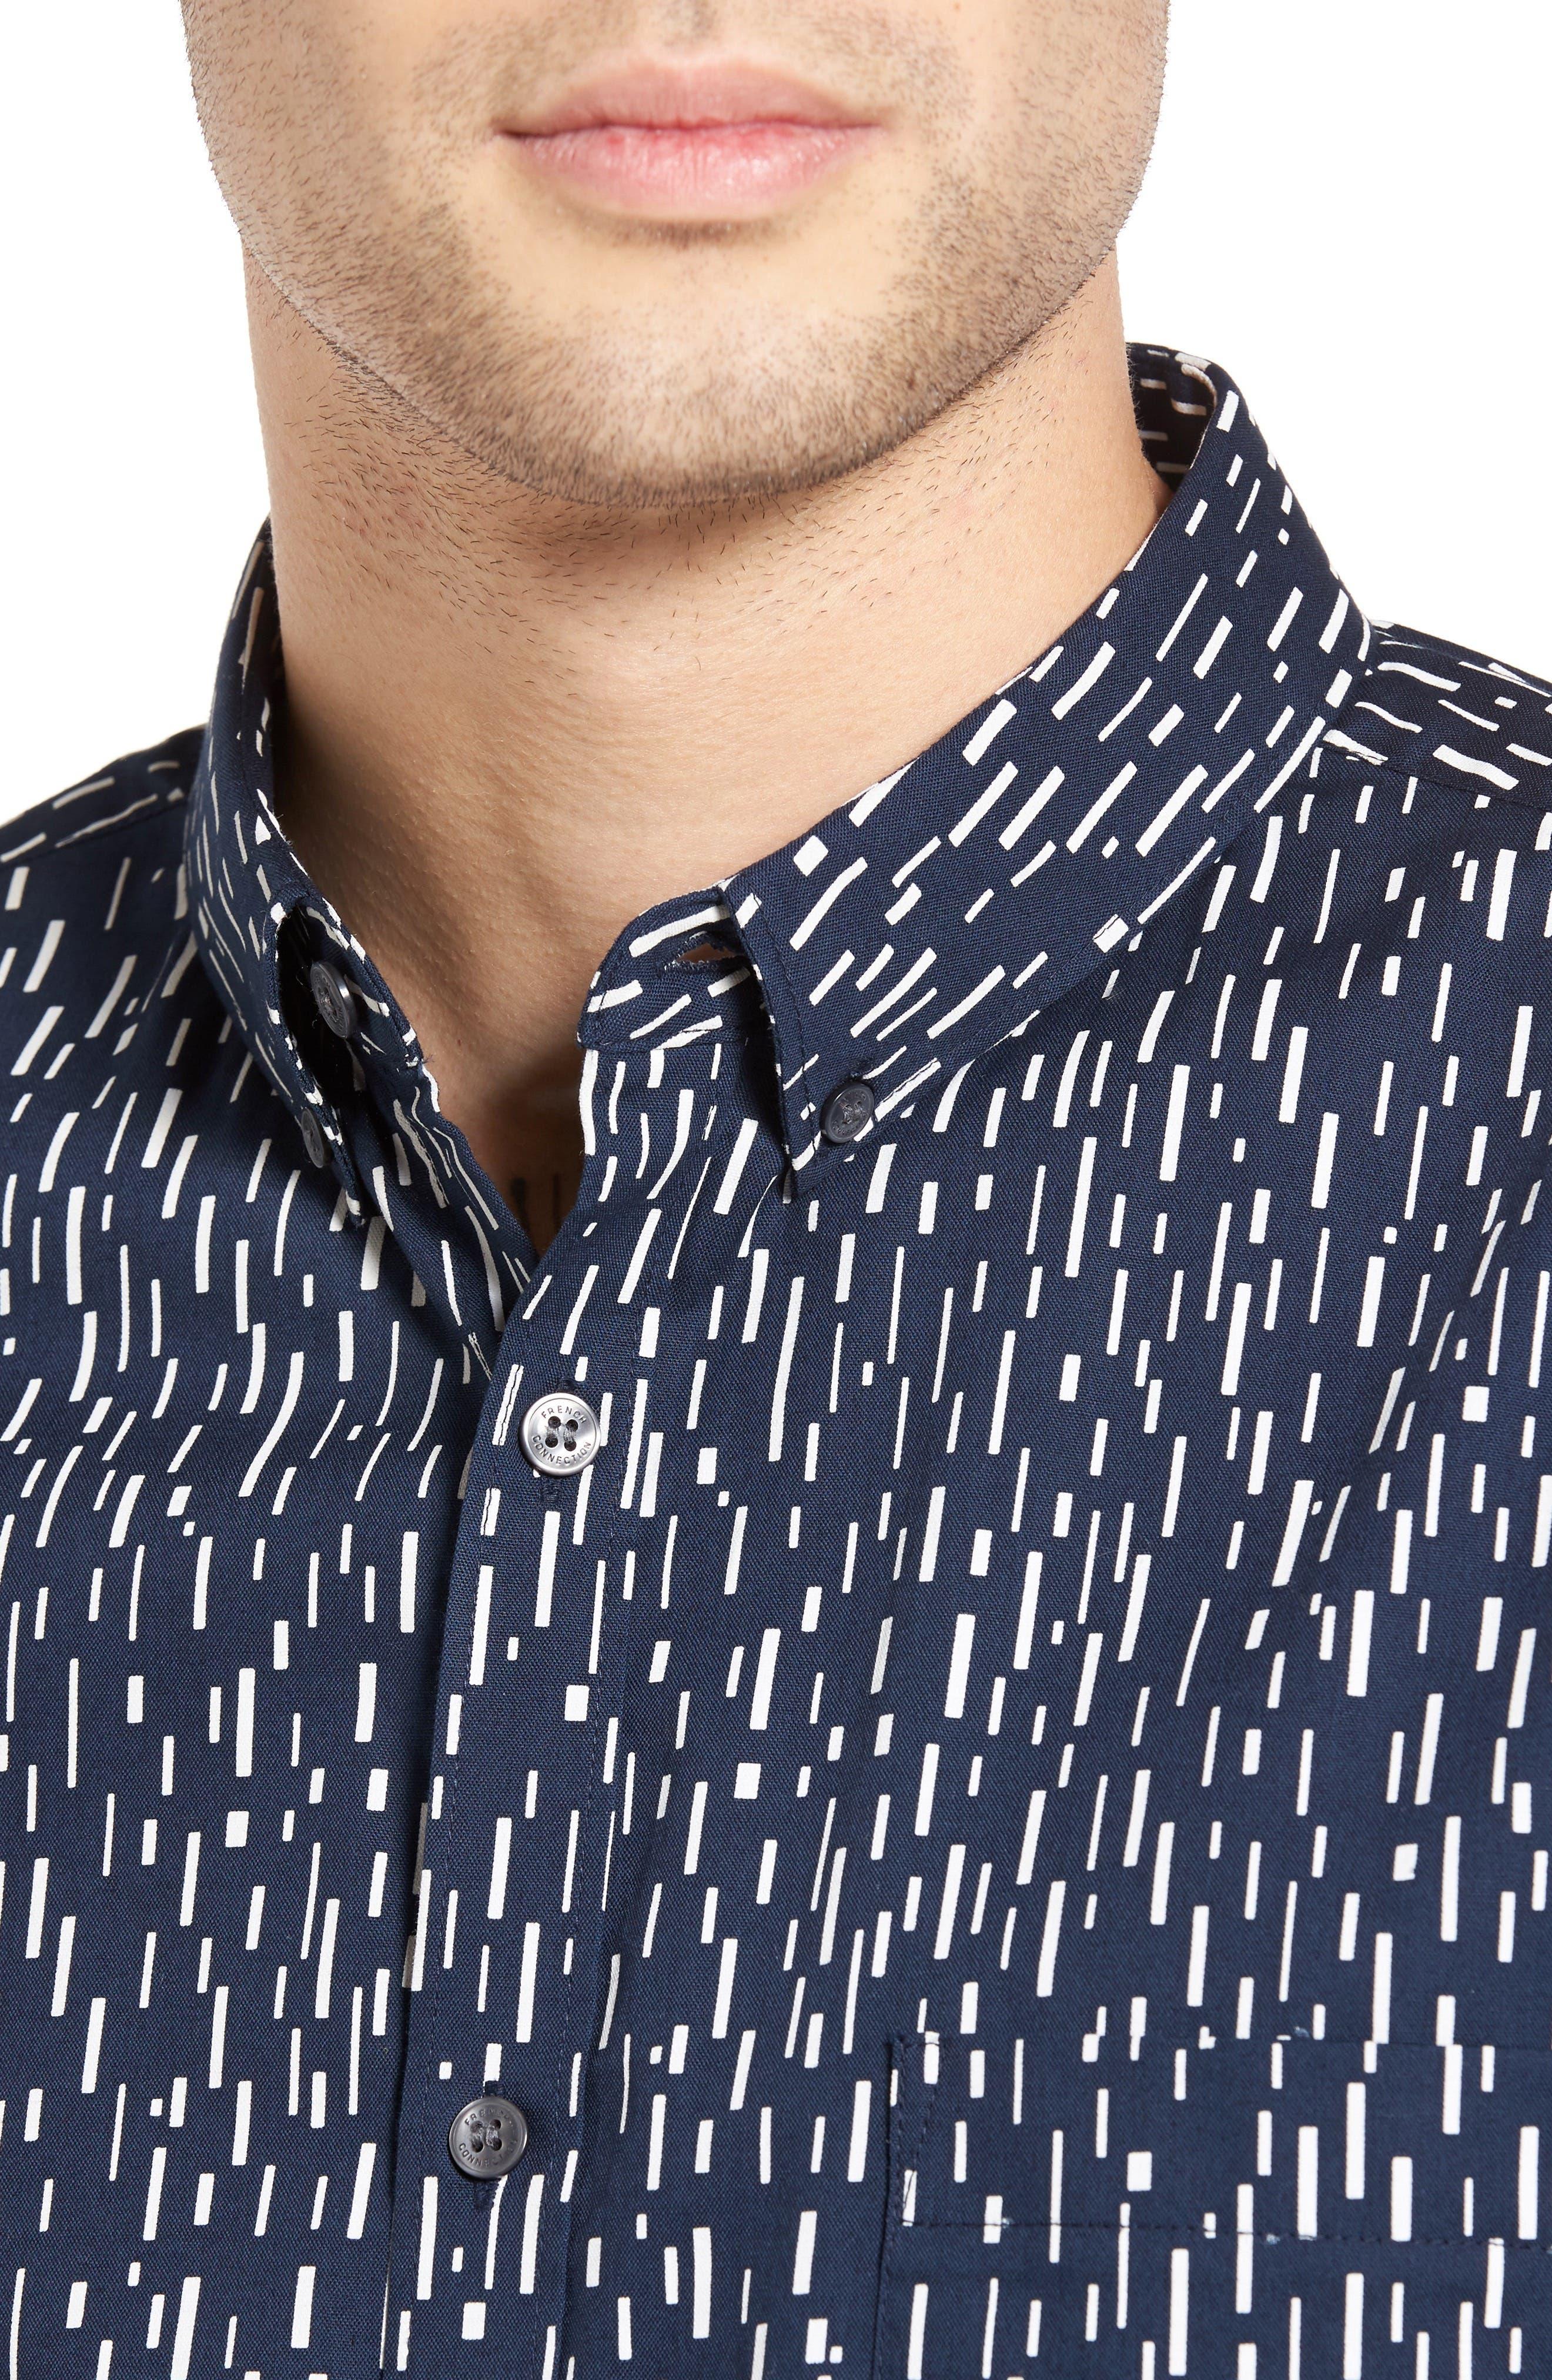 Rain Dash Slim Fit Oxford Shirt,                             Alternate thumbnail 4, color,                             Marine Blue/ White